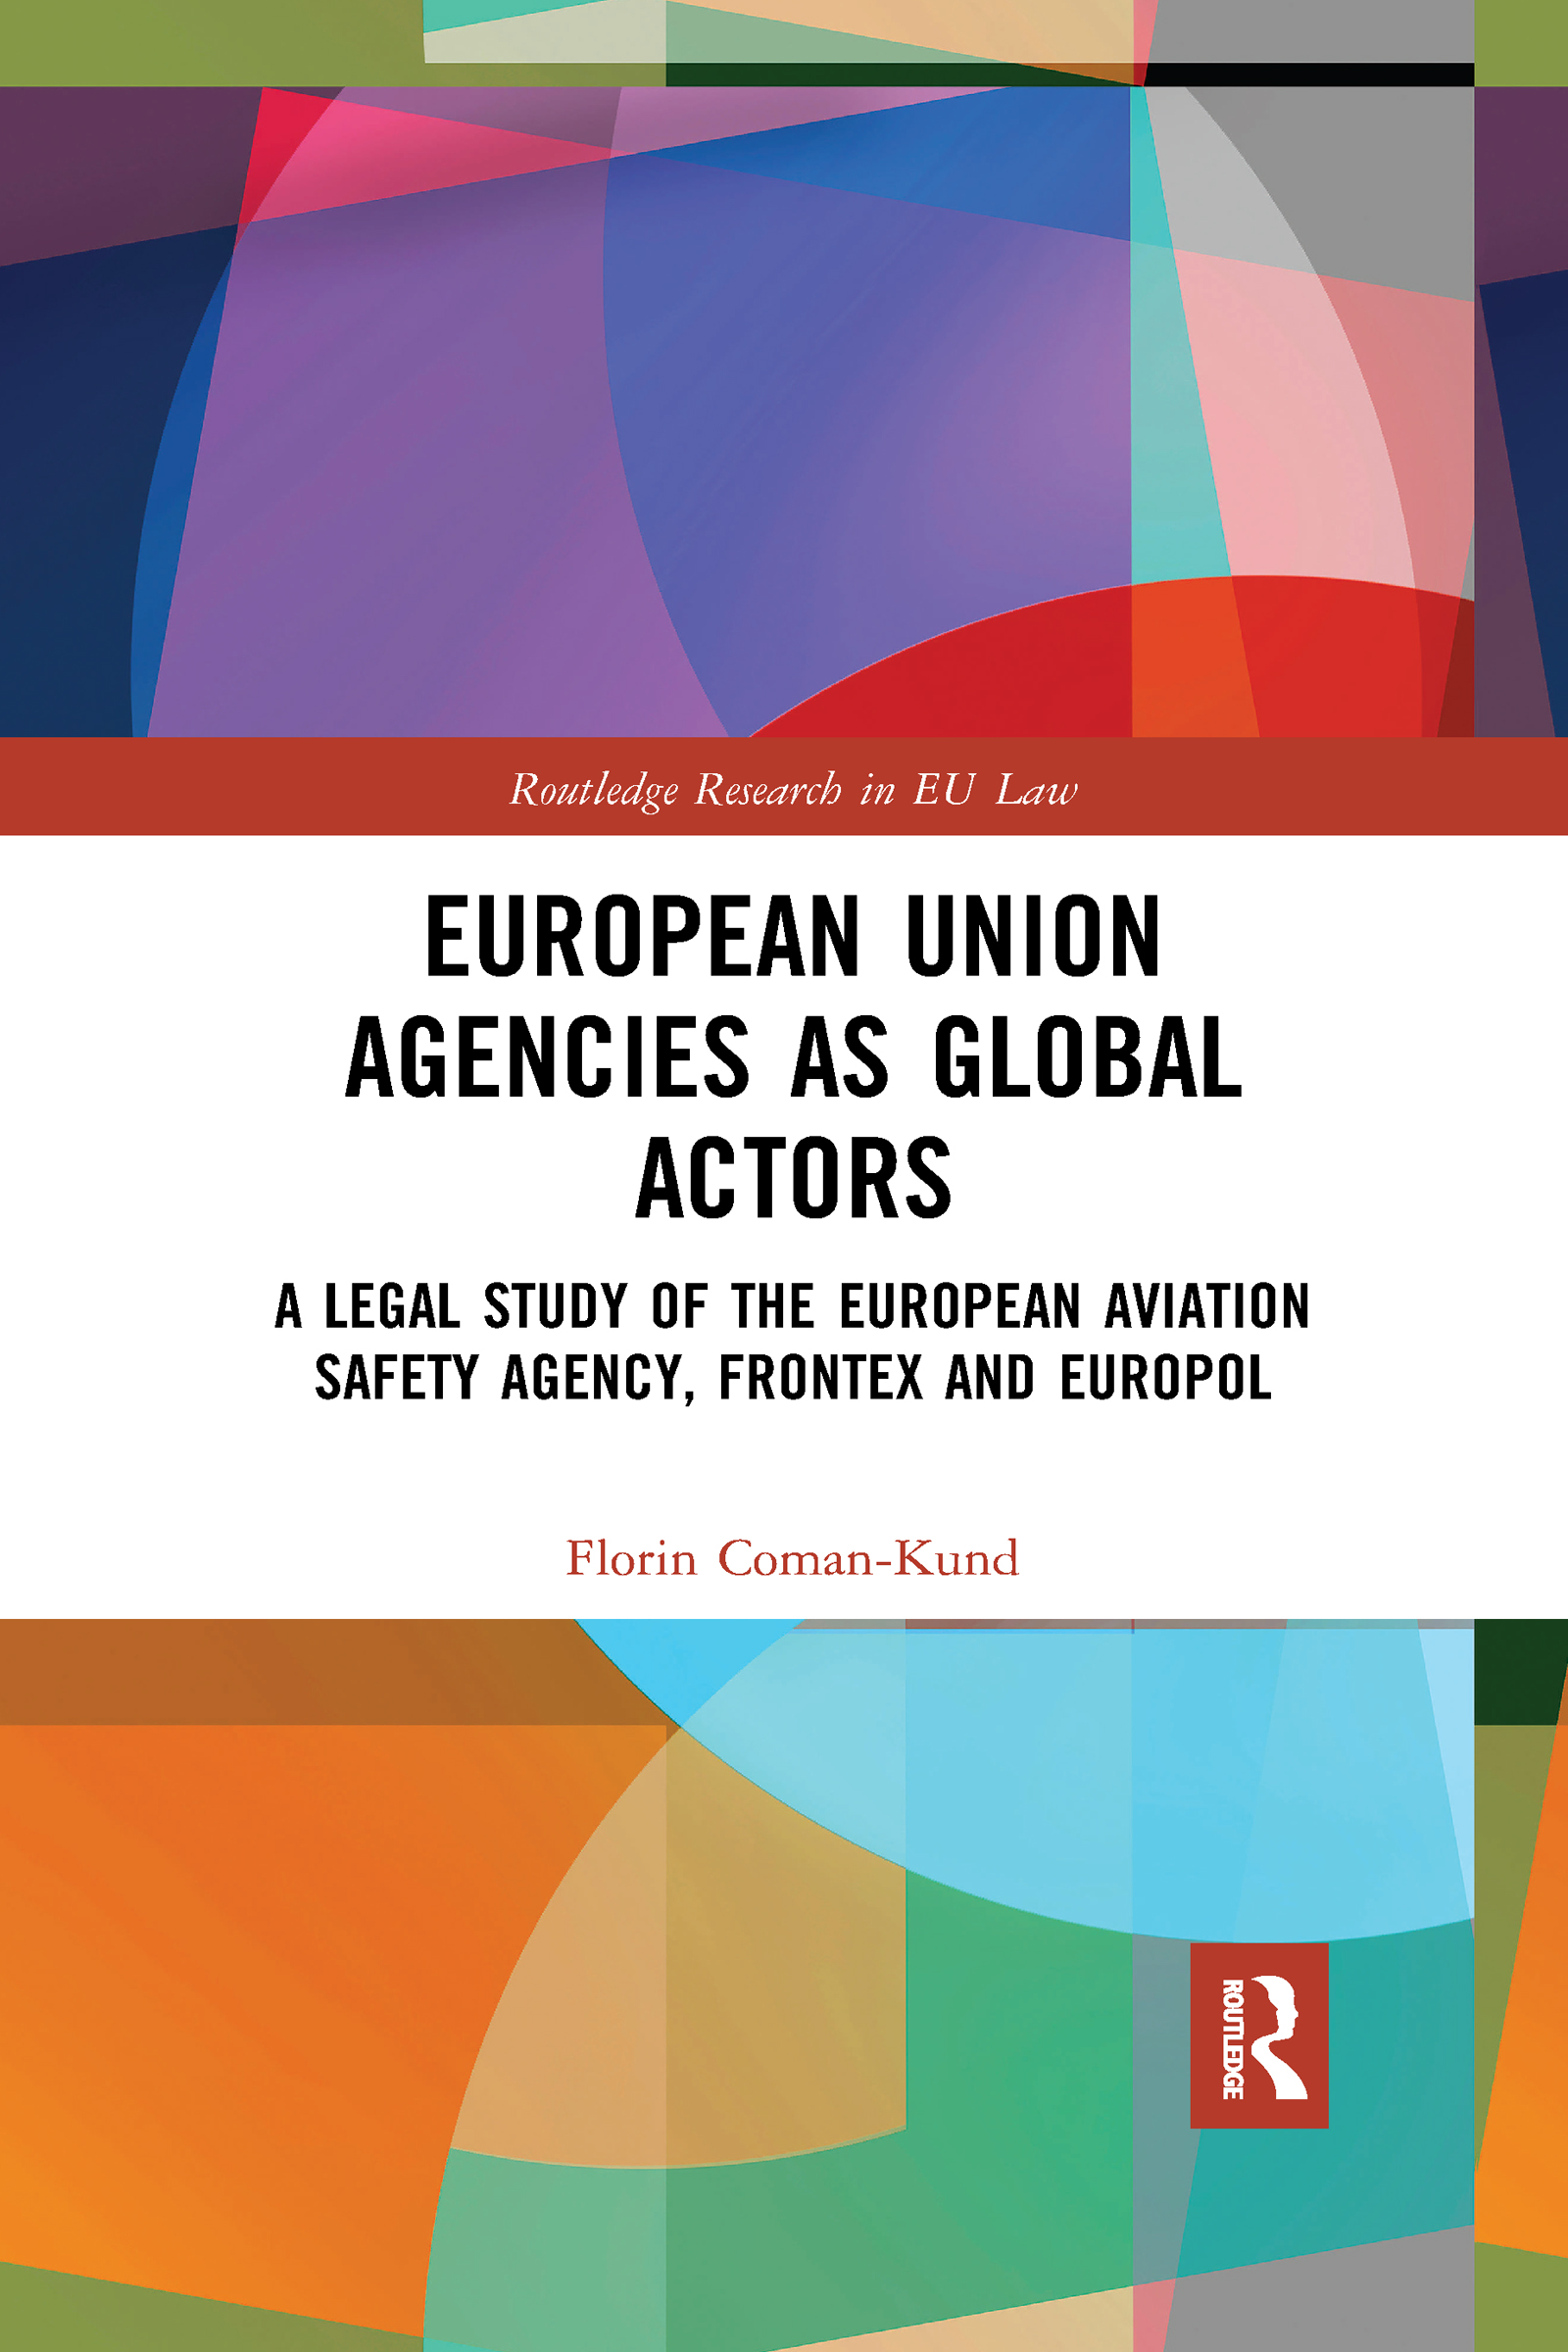 European Union Agencies as Global Actors